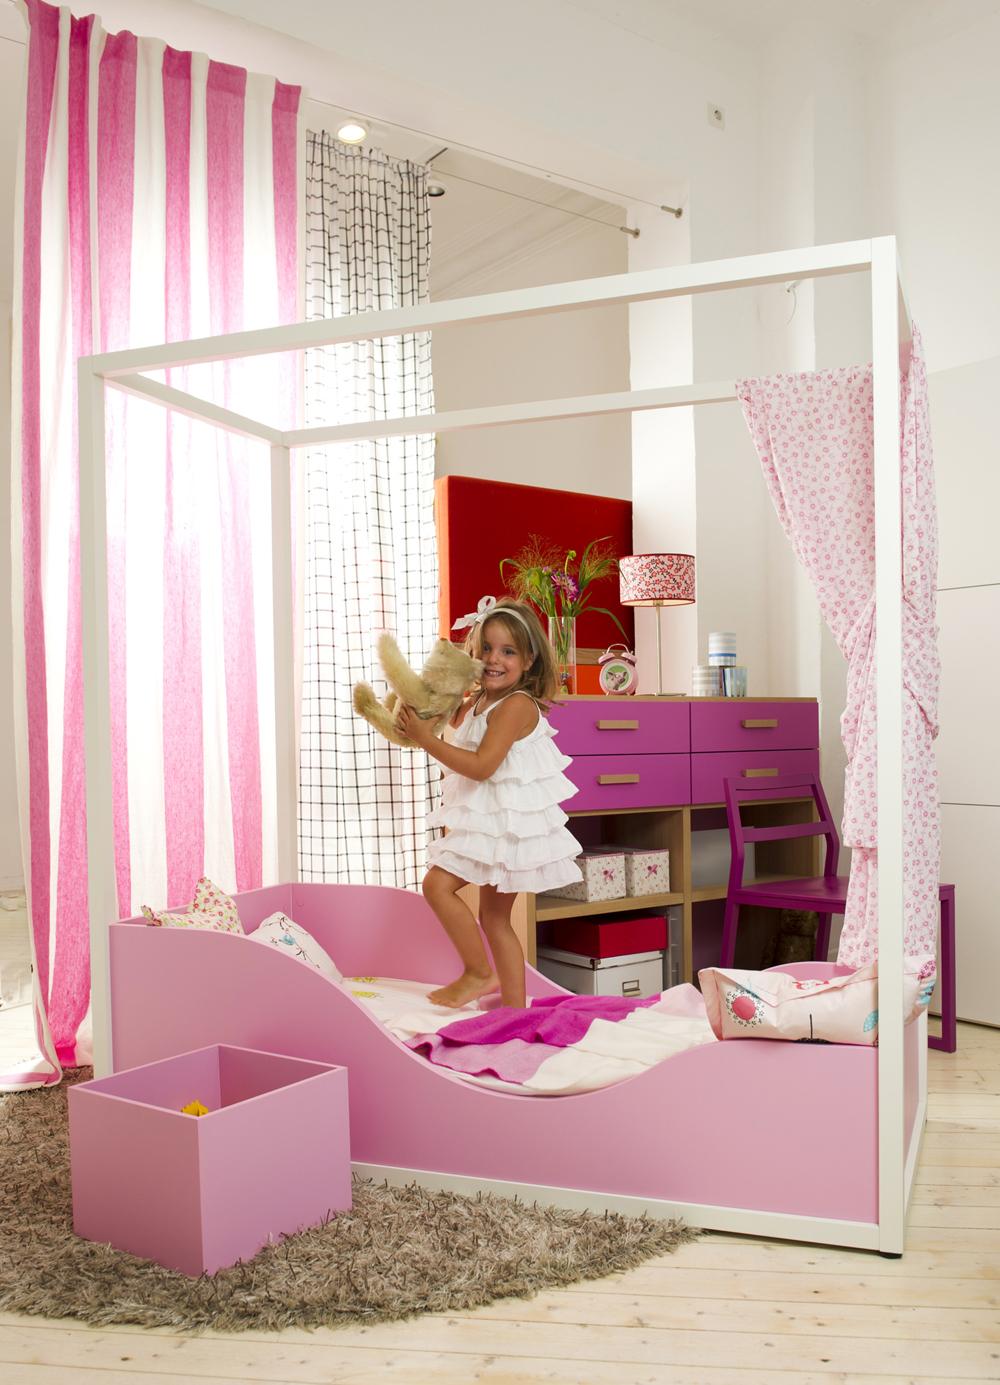 Full Size of Kinderbett Mädchen Hochwertige Kinderbetten Und Jugendbetten Bett Betten Wohnzimmer Kinderbett Mädchen